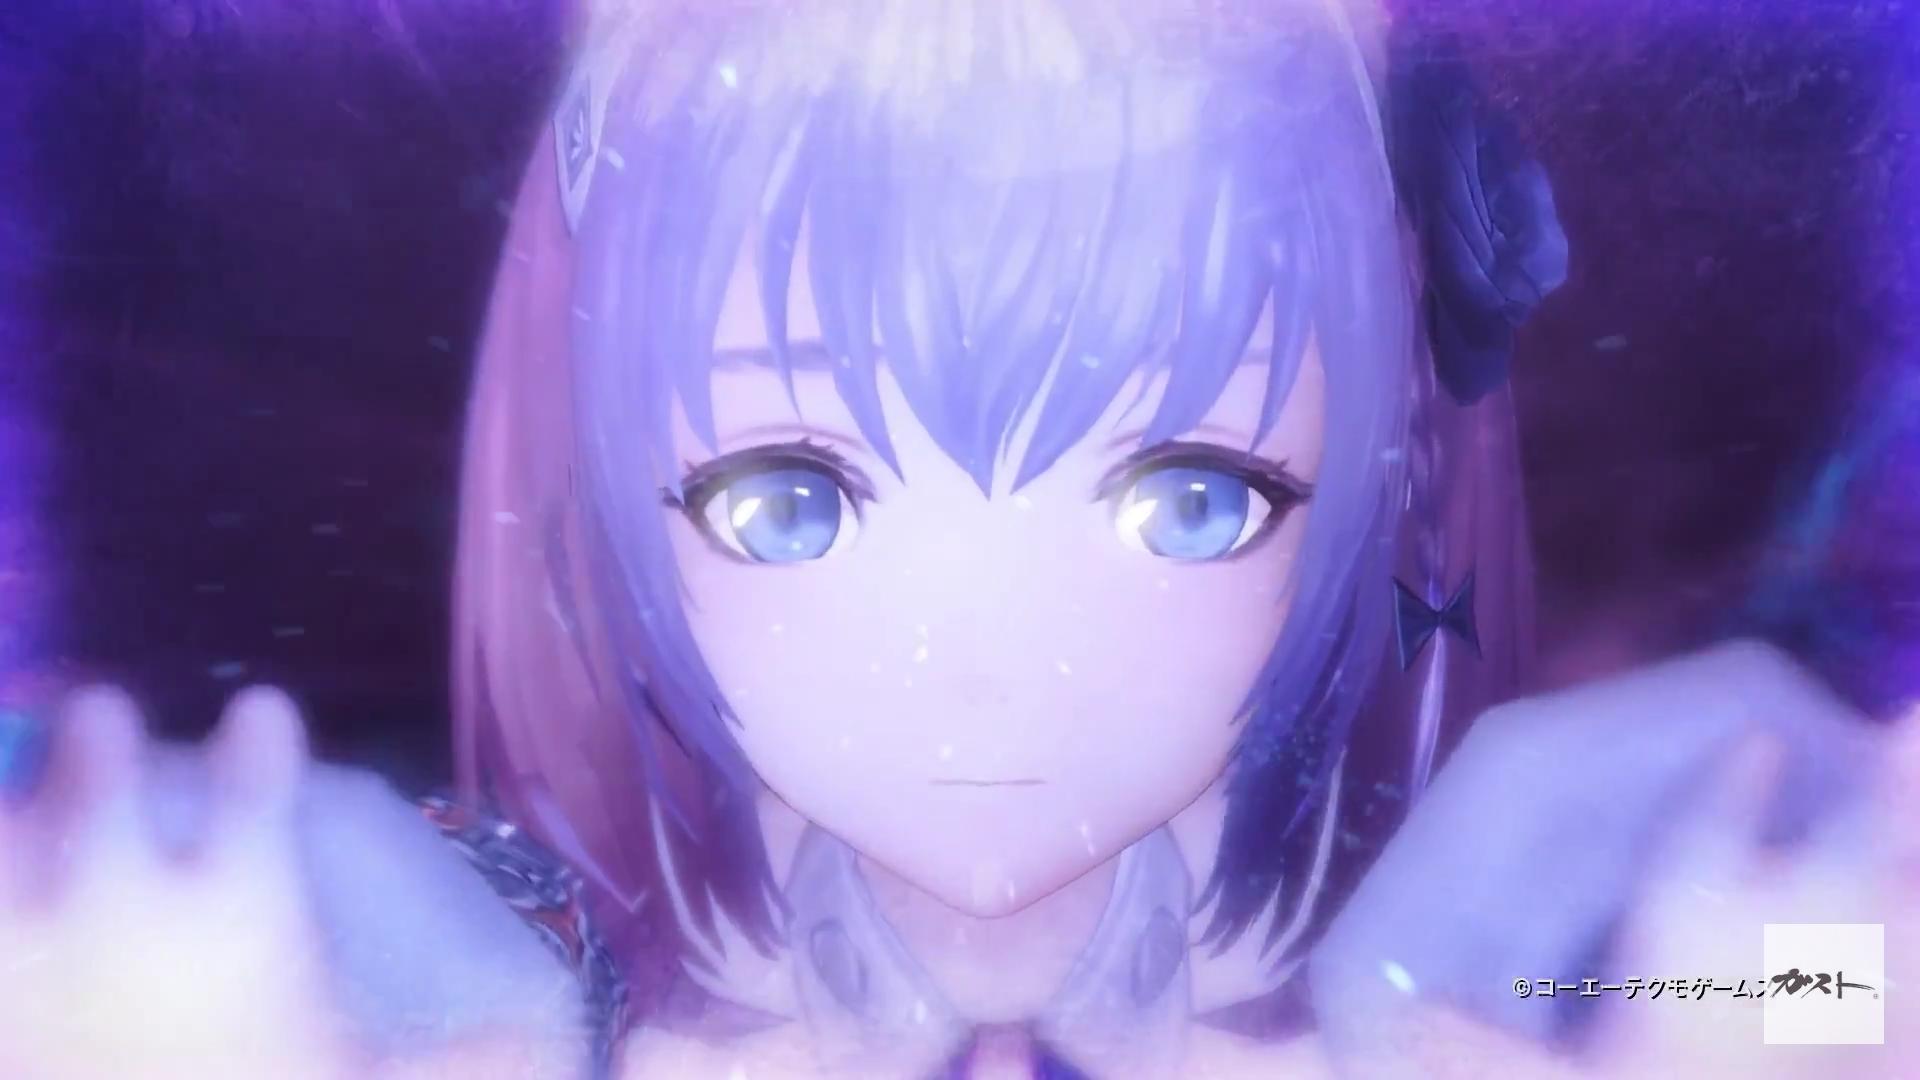 RPG游戏《无夜之国2:新月的花嫁》CM发布,确定8月31日发售-ANICOGA